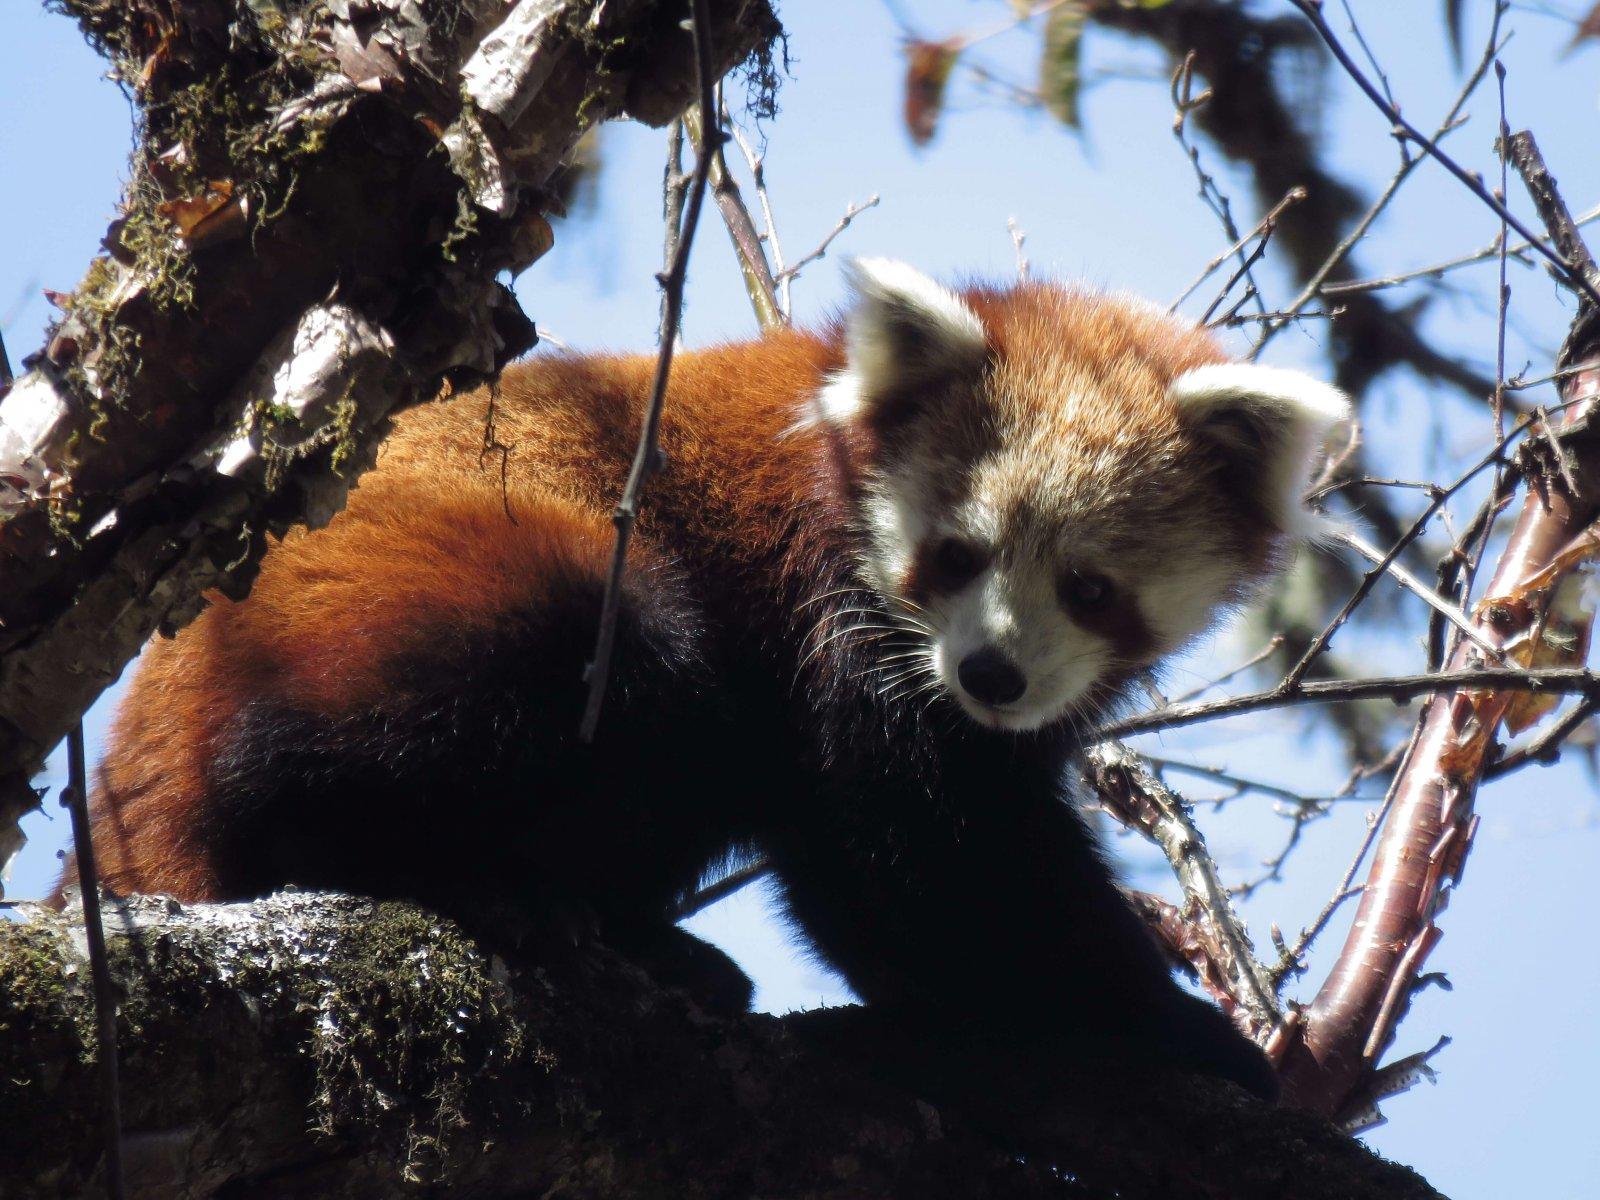 Red Panda (Endangered) in Arunachal, India © Rimung Tasso